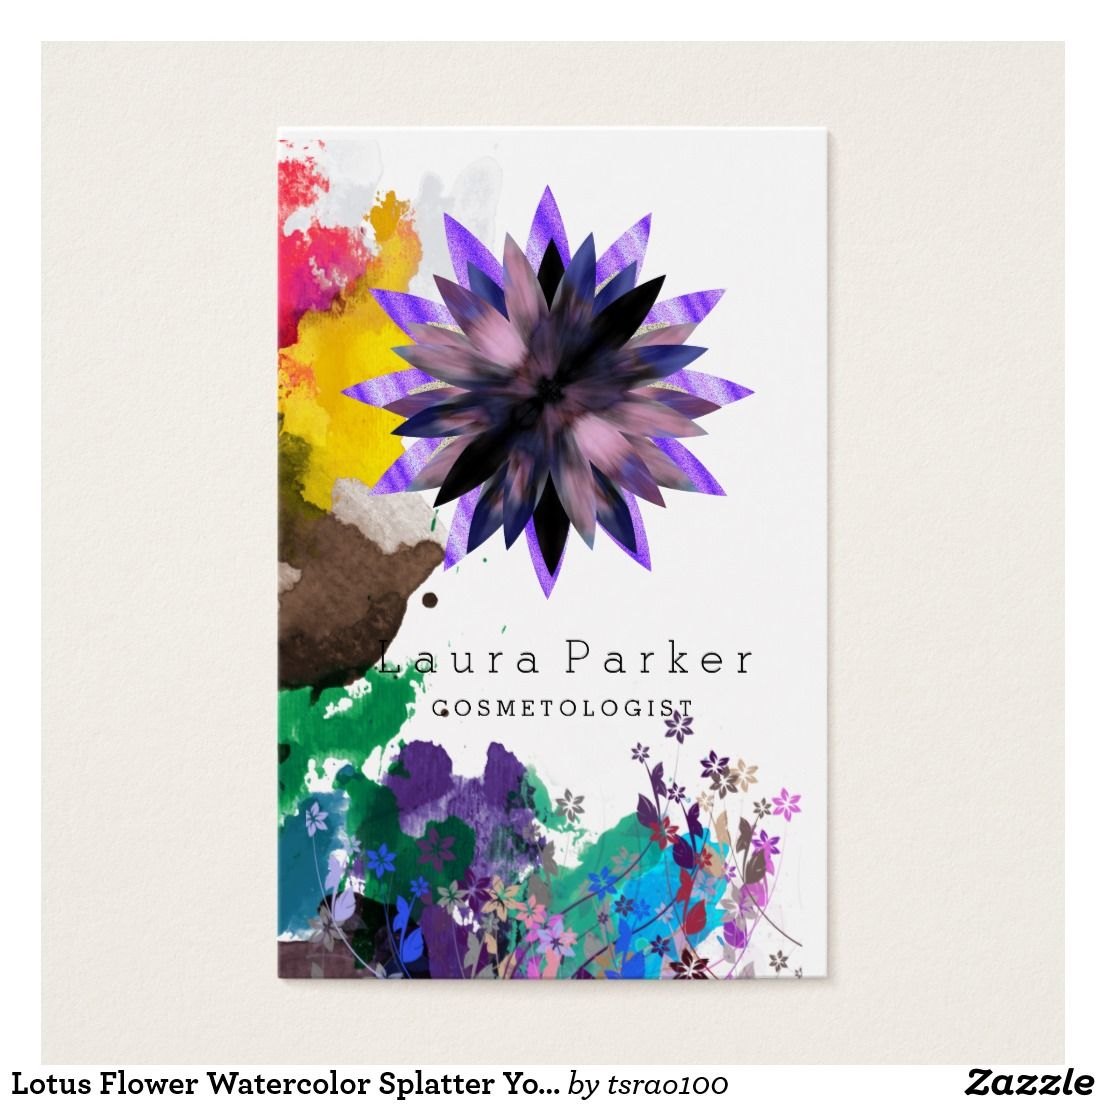 Lotus flower watercolor splatter yoga holistic spa business card lotus flower watercolor splatter yoga holistic spa izmirmasajfo